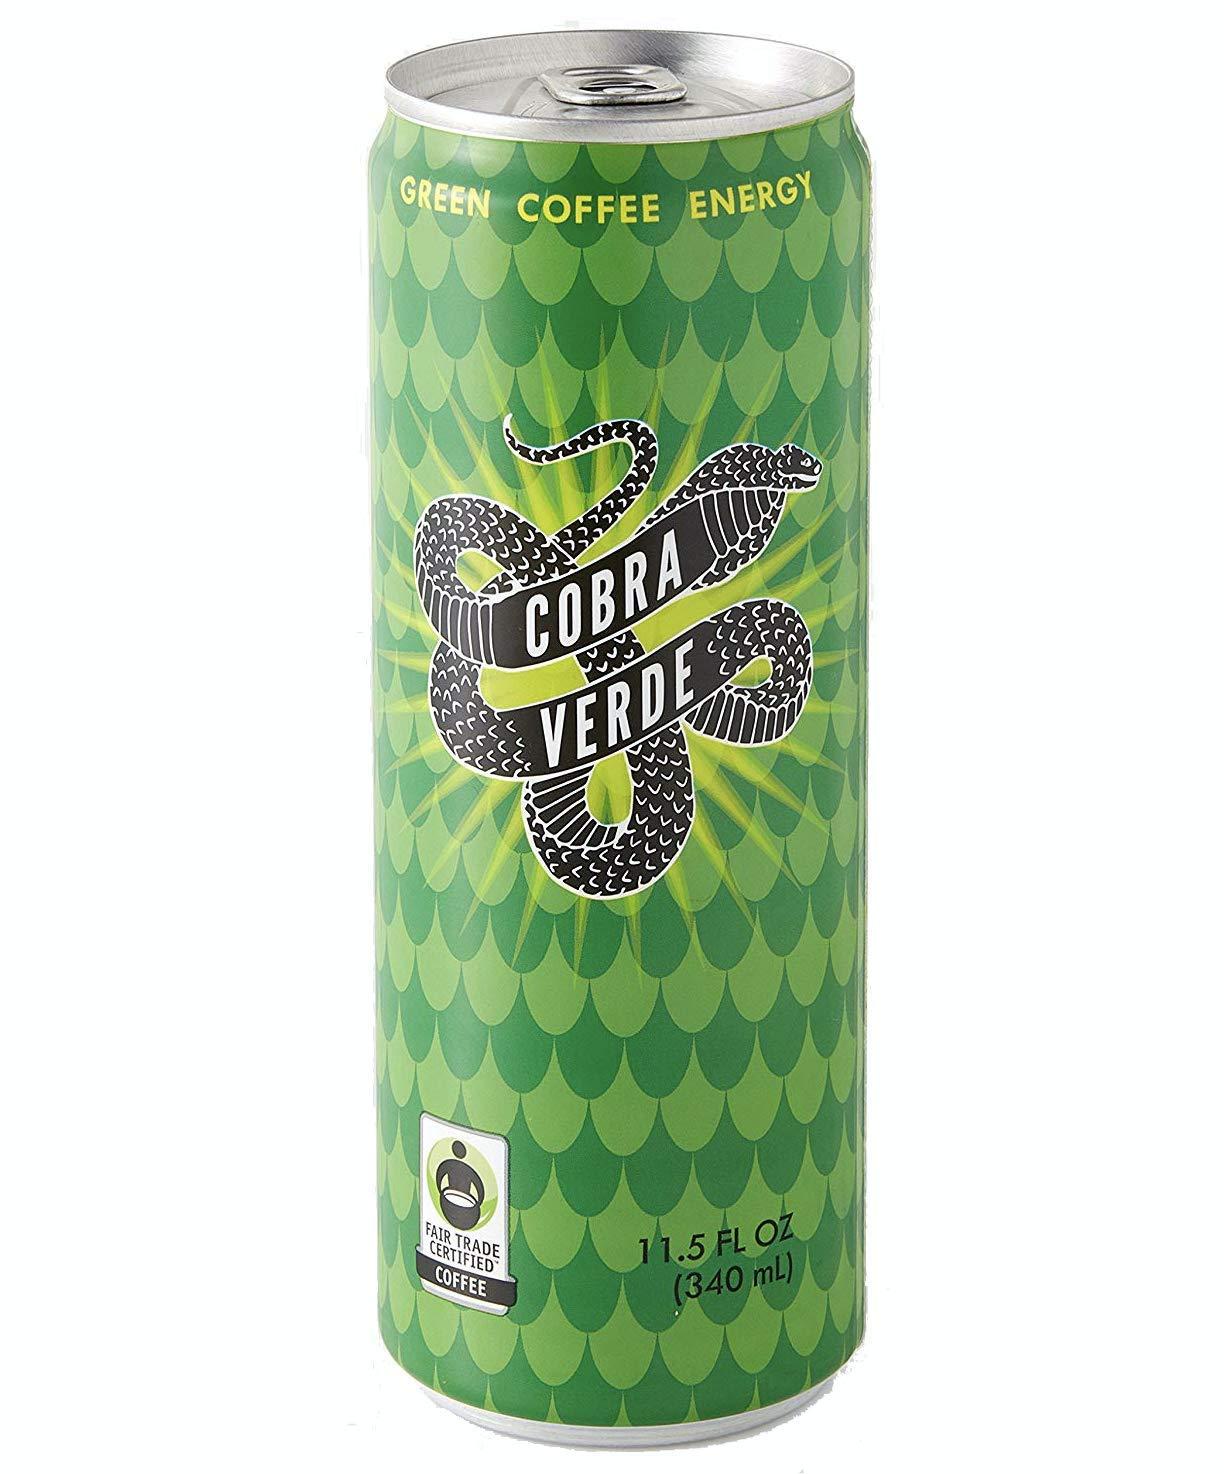 Cobra Verde Green Coffee Citrus Beverage, Fair Trade Certified, - 11.5 Fl Oz | Pack of 24 by Cobra Verde